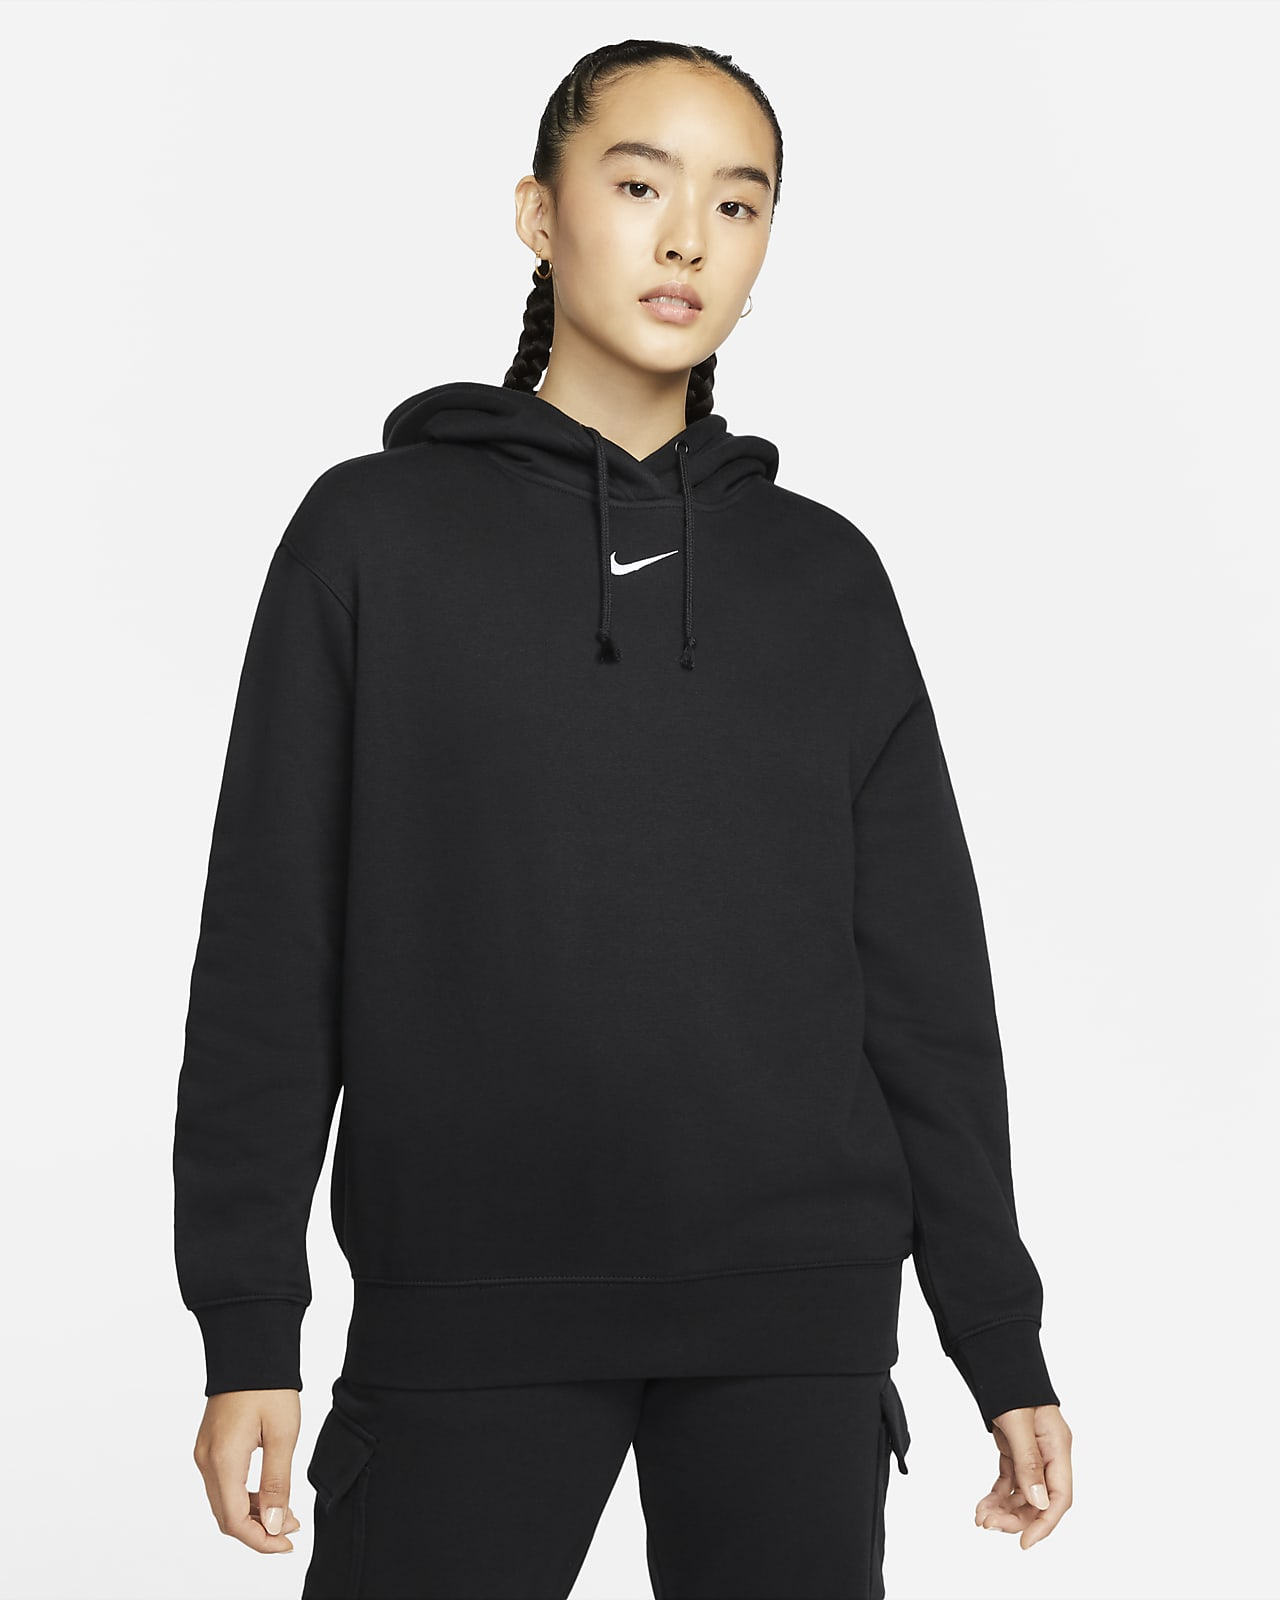 Nike Sportswear Collection Essentials Women's Oversized Fleece Hoodie